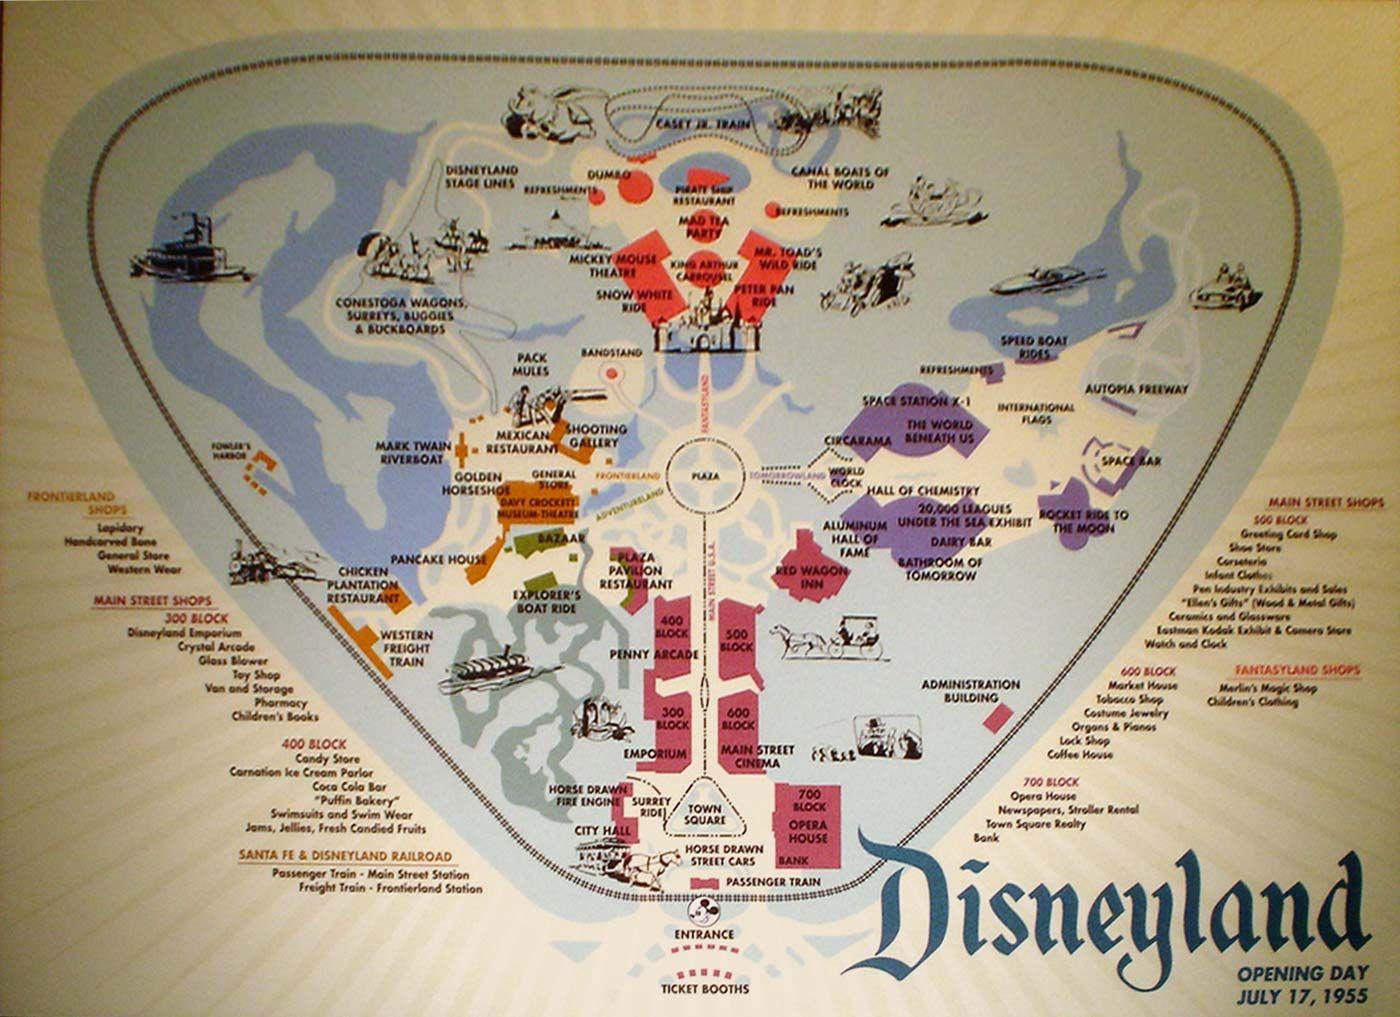 Best Disneyland Maps Images On Pinterest - Disneyland usa location map